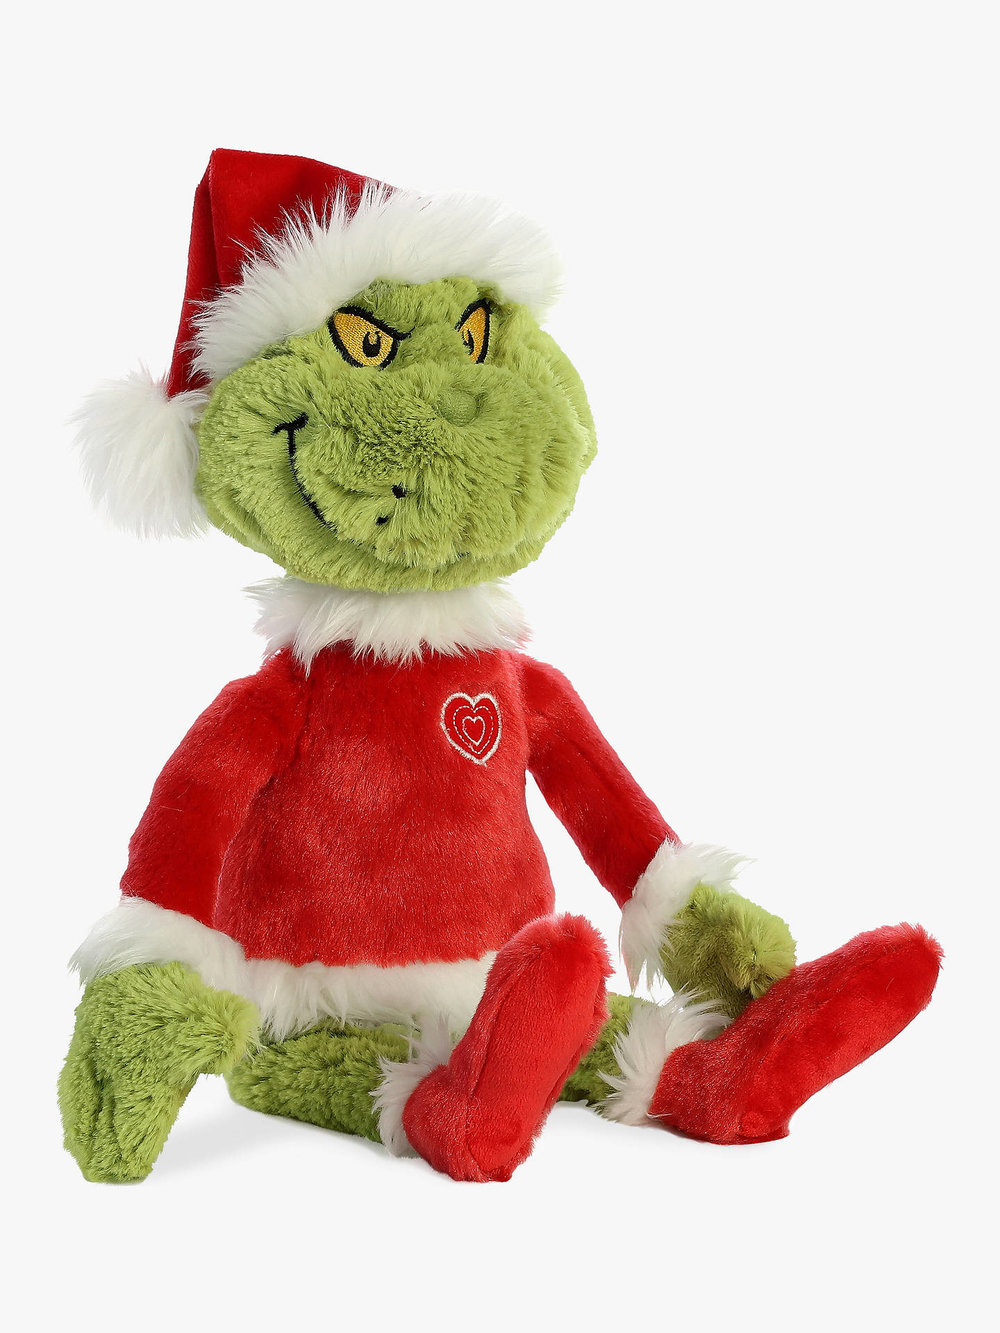 grinch toy (004).jpg